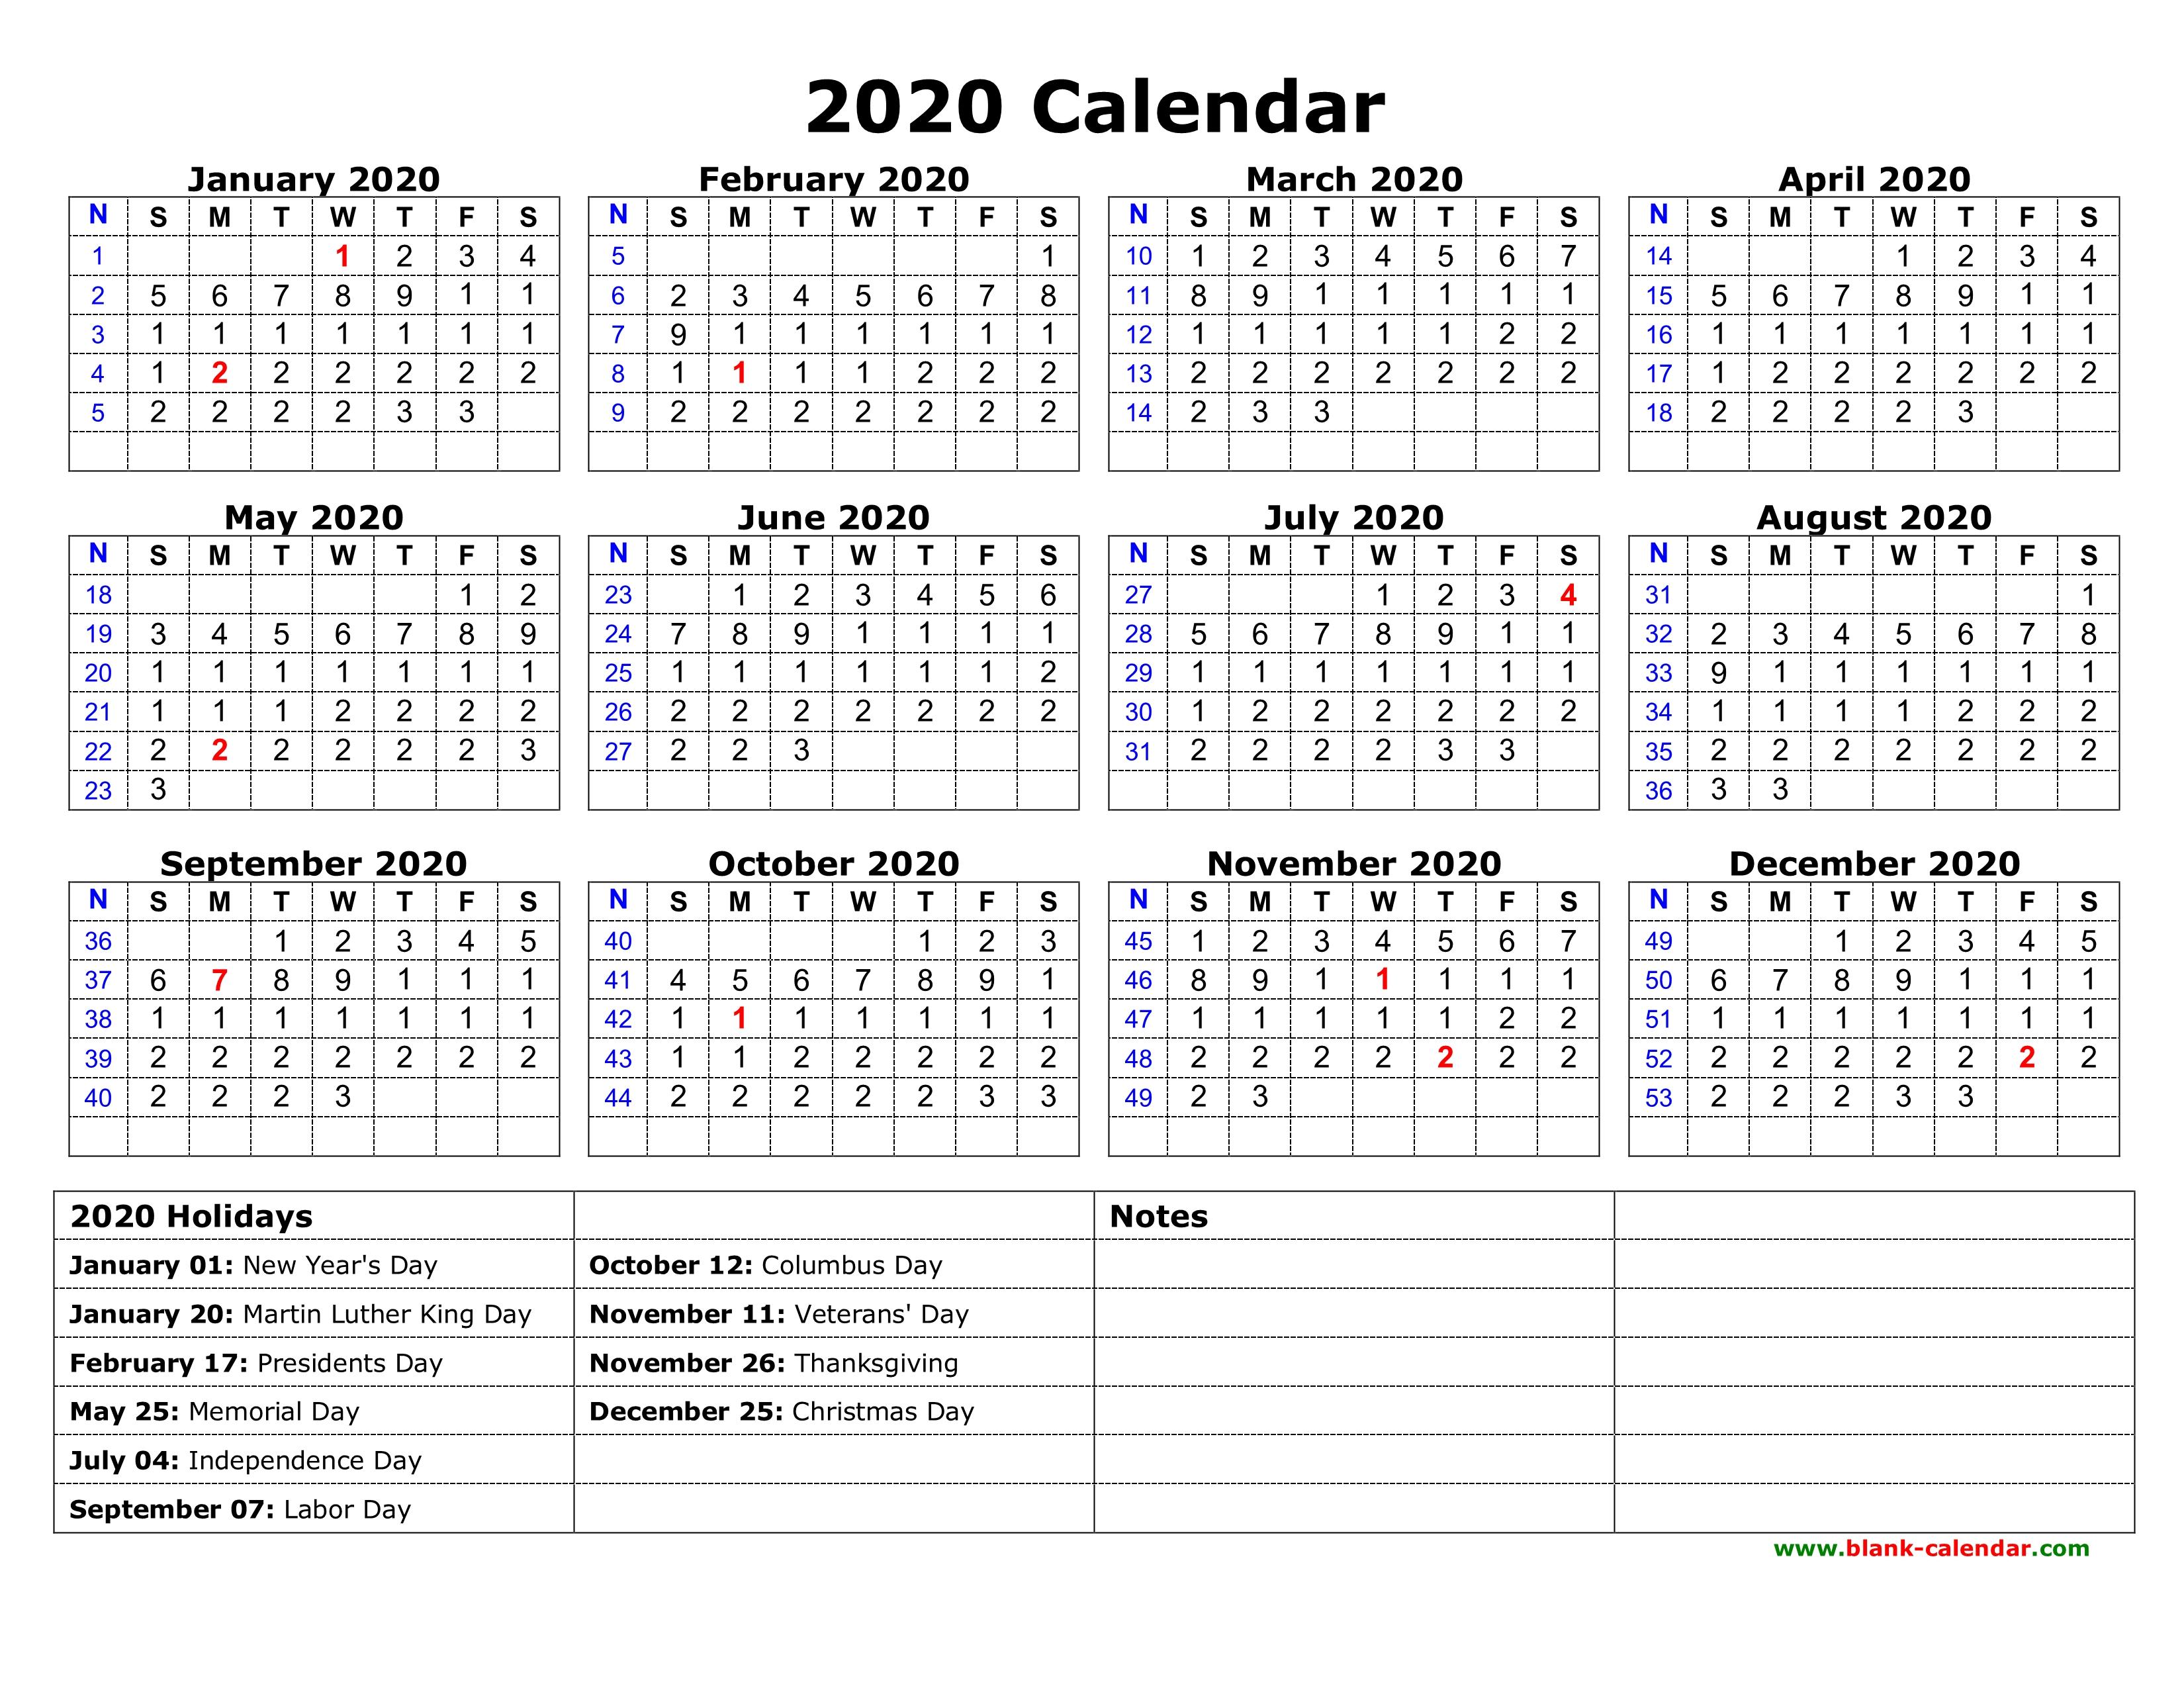 2020 Us Calendar With Holidays Printable - Wpa.wpart.co for 2020 Yearly Calendar With Holidays